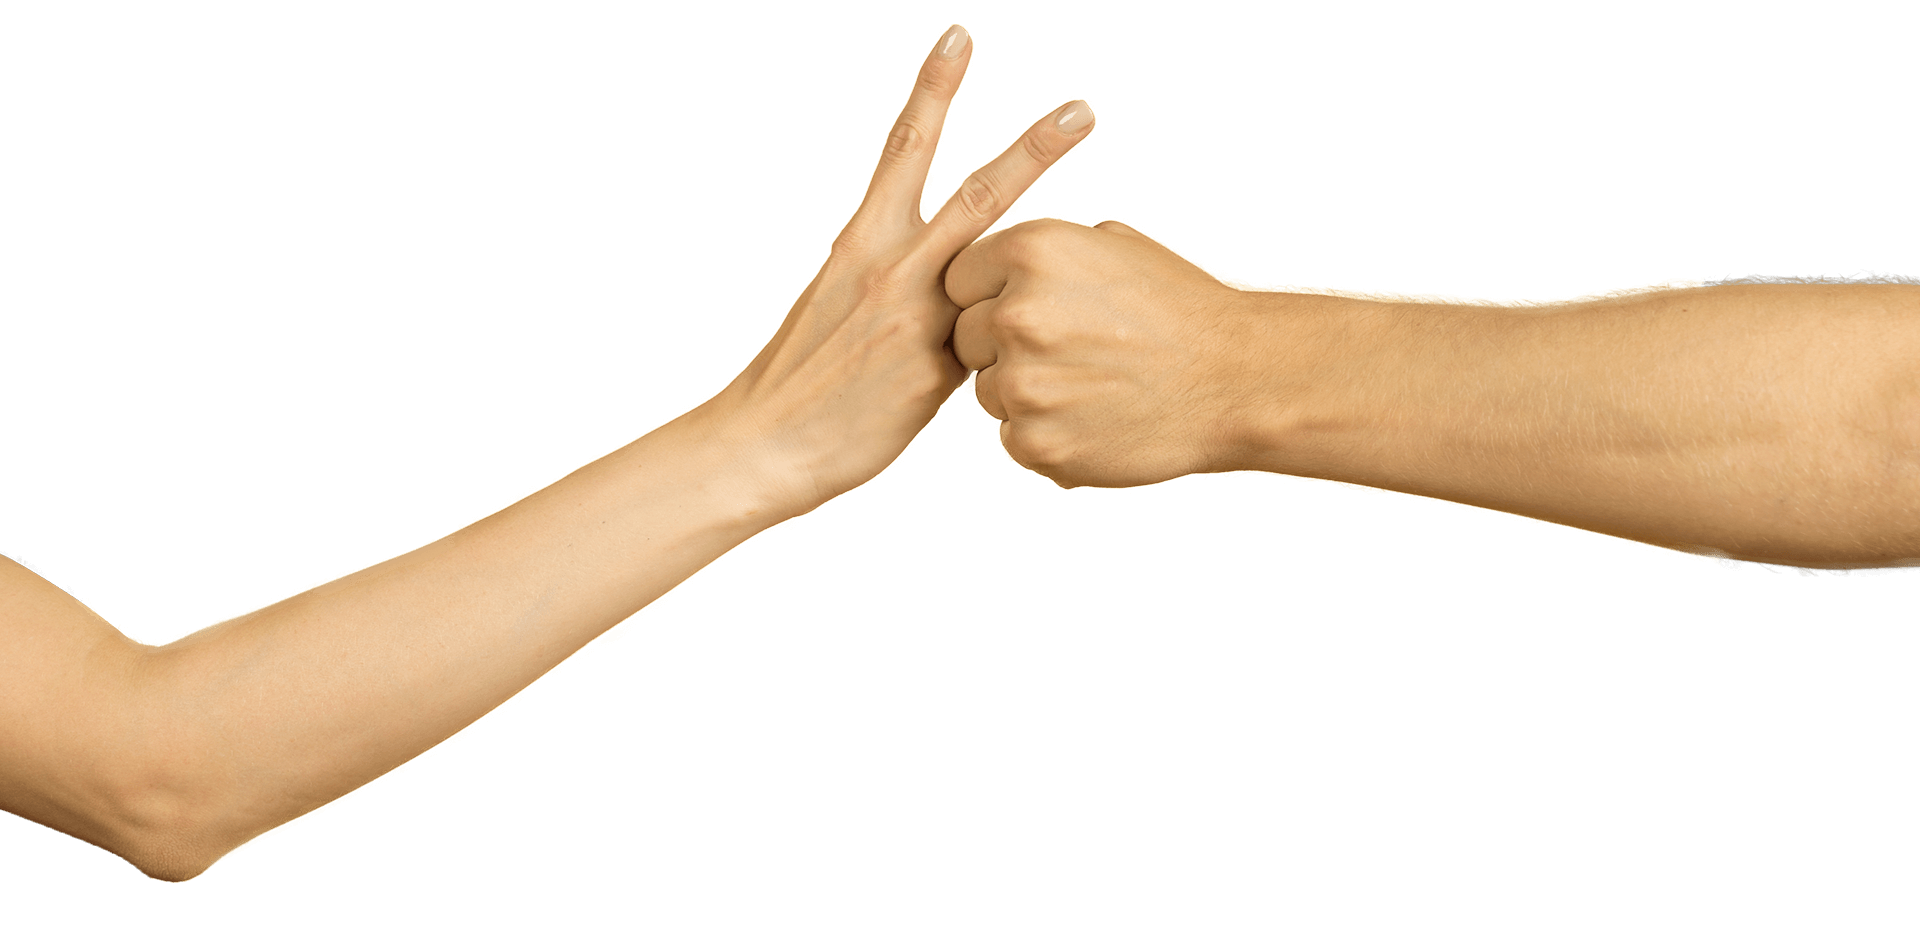 Photo of 2 hands making a snail shape, snail step 3